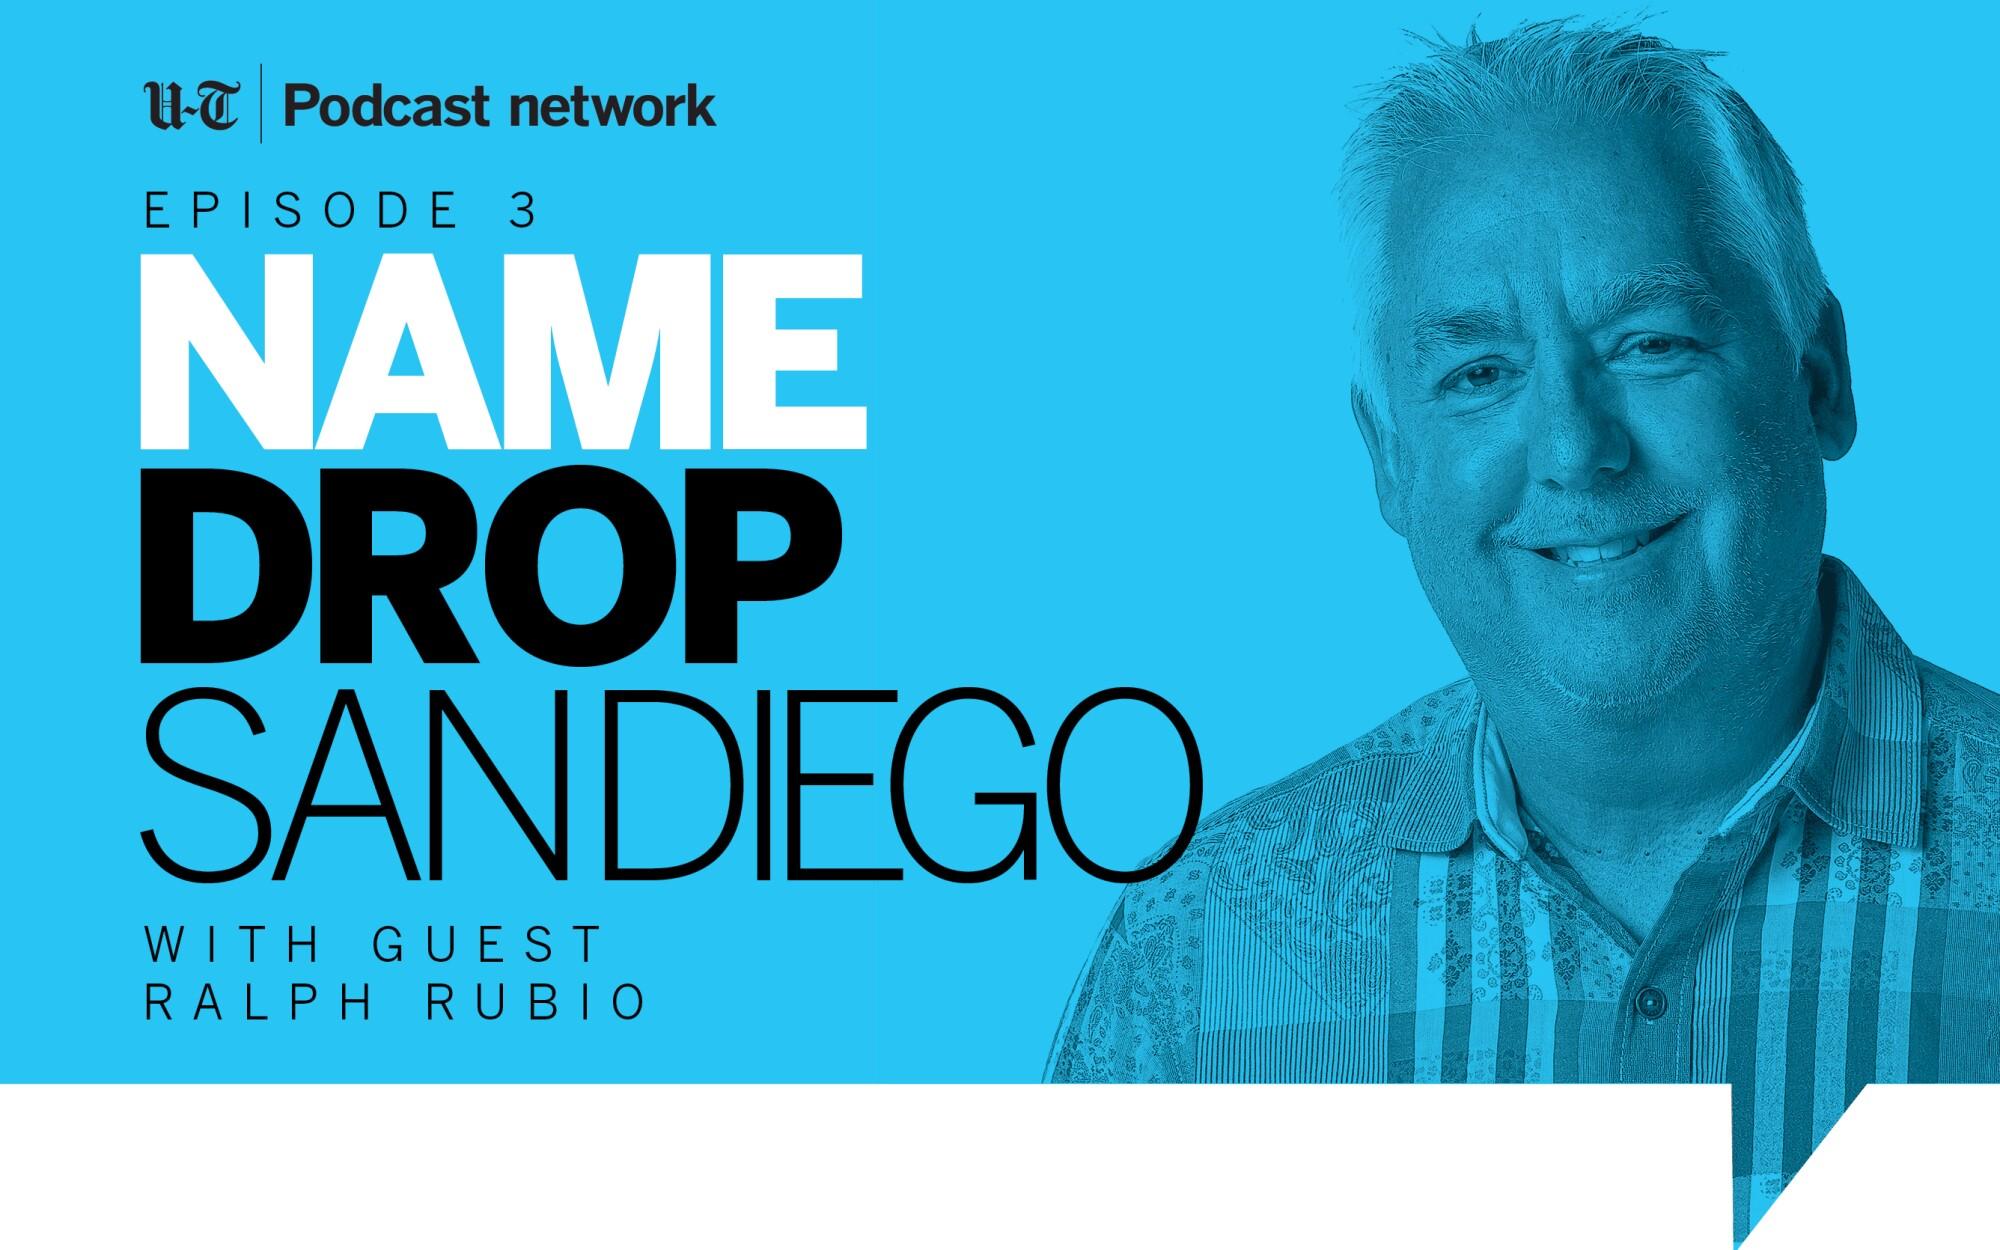 Ralph Rubio on Name Drop San Diego.